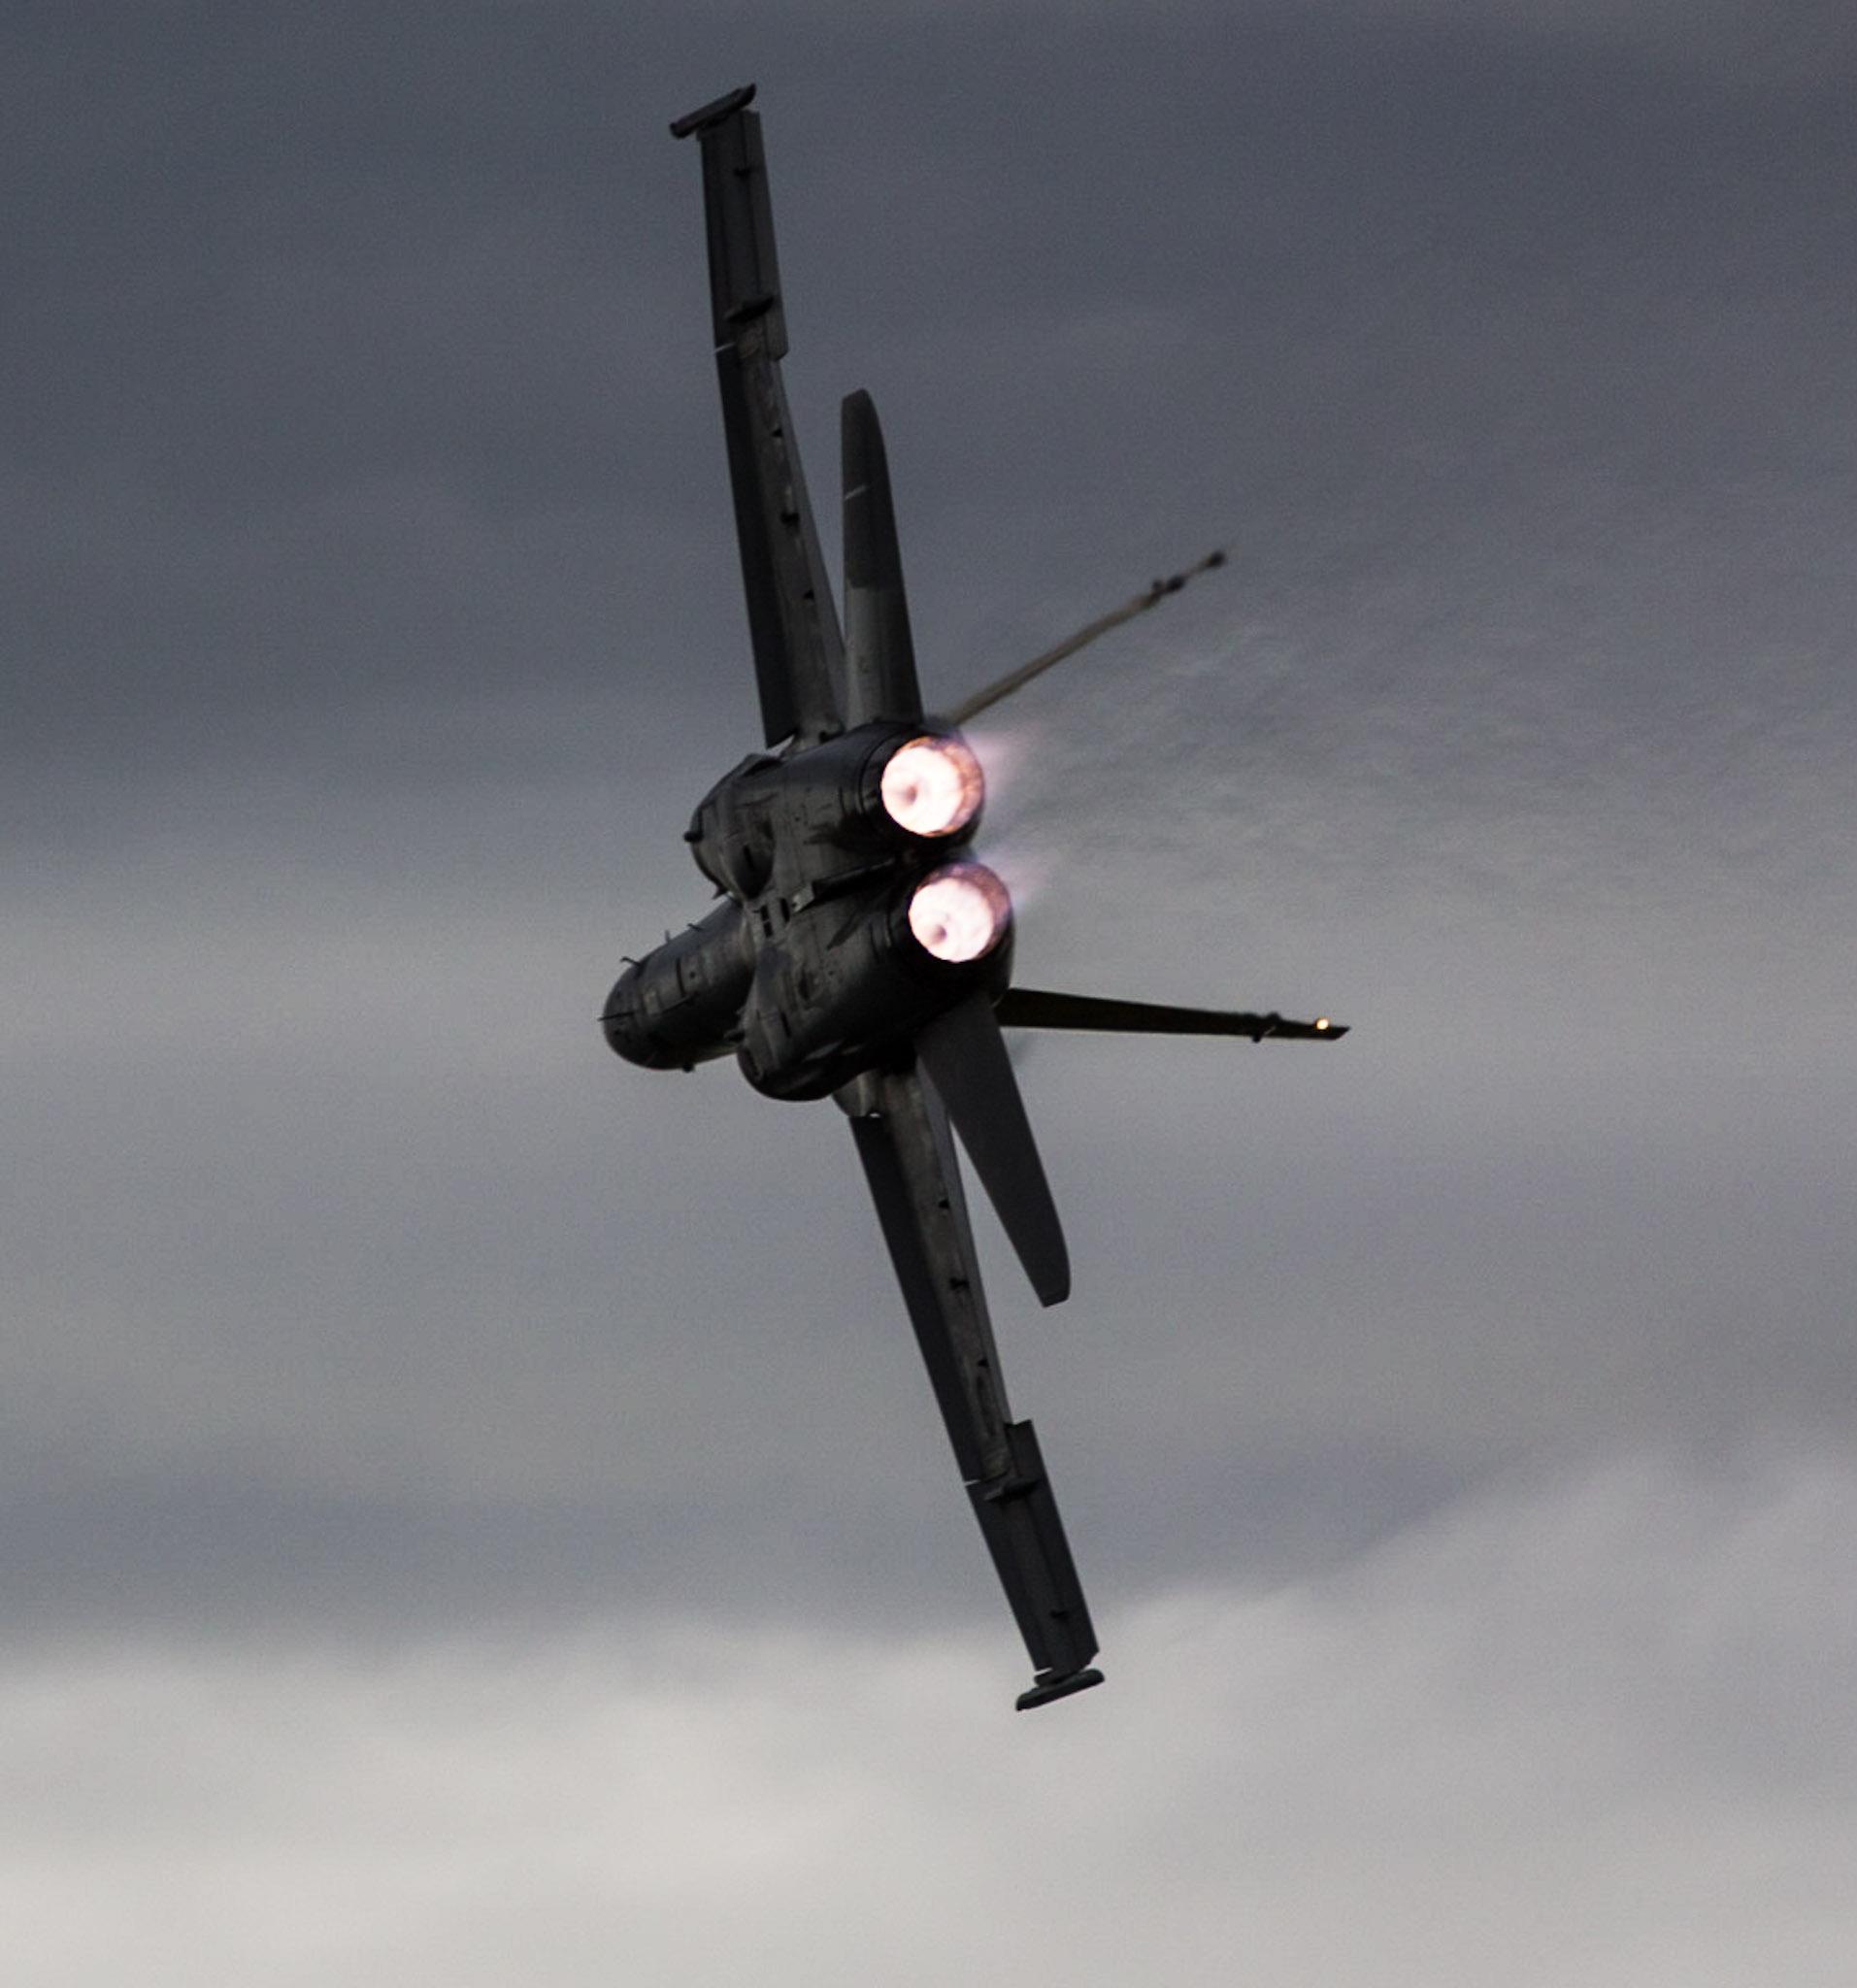 FA18 Hornet Going Home